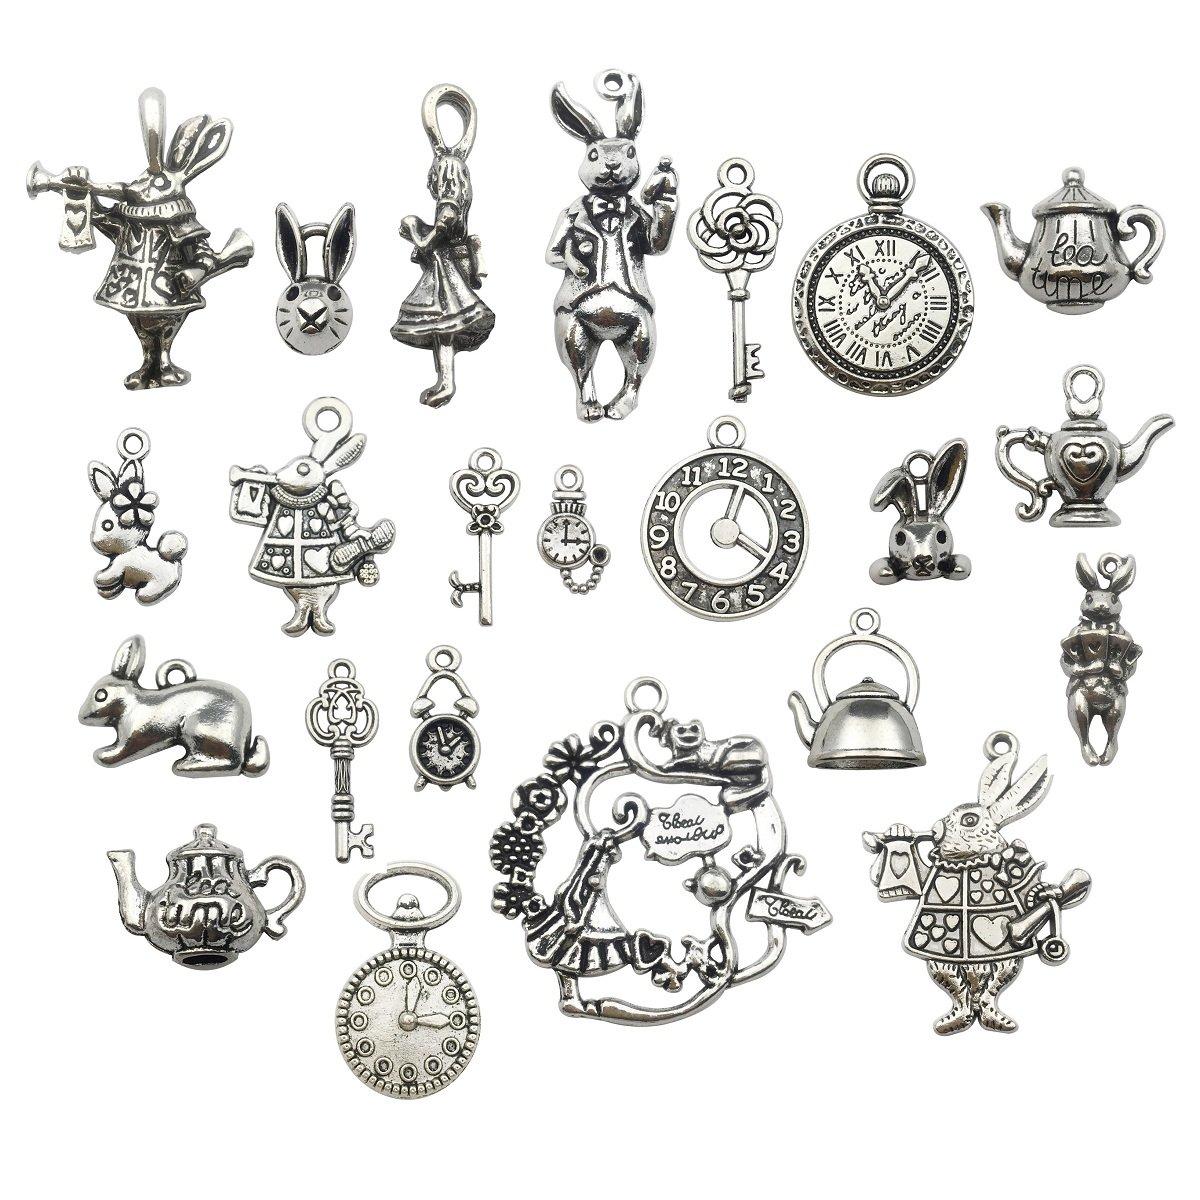 40pcs Antique Bronze Alice in Wonderland Fairy Tales Tea Party Steampunk Victorian Necklace Bracelet Charms (antique bronze) iloveDIYbeads cn0019cn0020